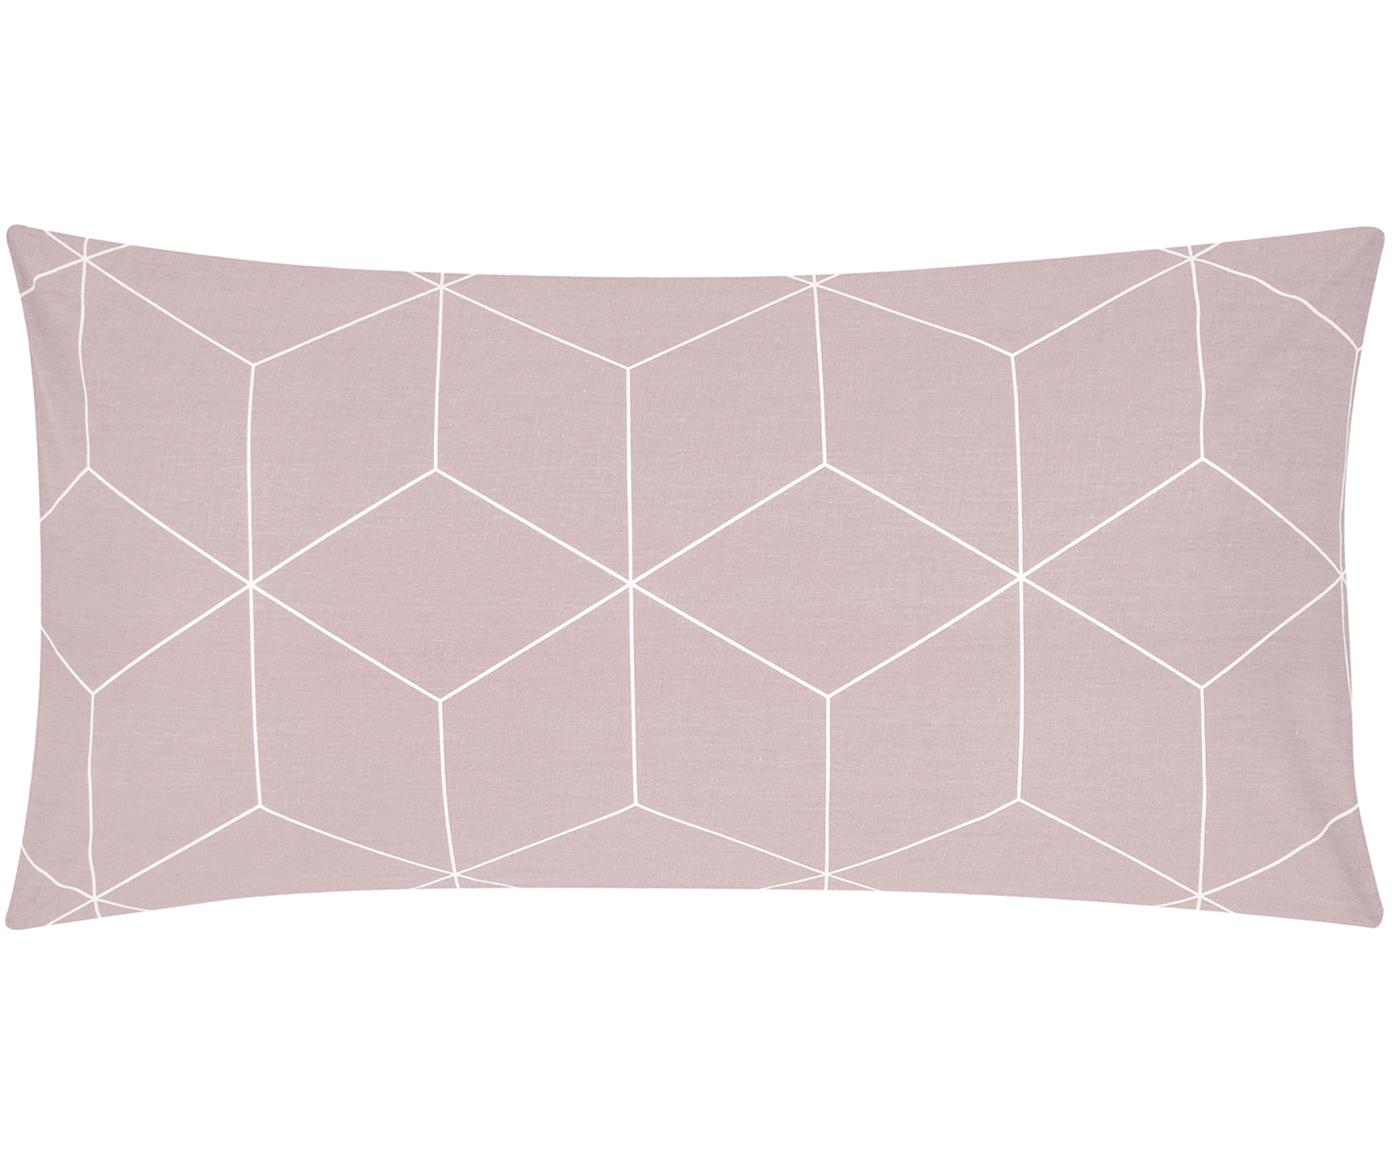 Baumwoll-Kissenbezüge Lynn mit grafischem Muster, 2 Stück, Webart: Renforcé Fadendichte 144 , Altrosa, Cremeweiss, 40 x 80 cm